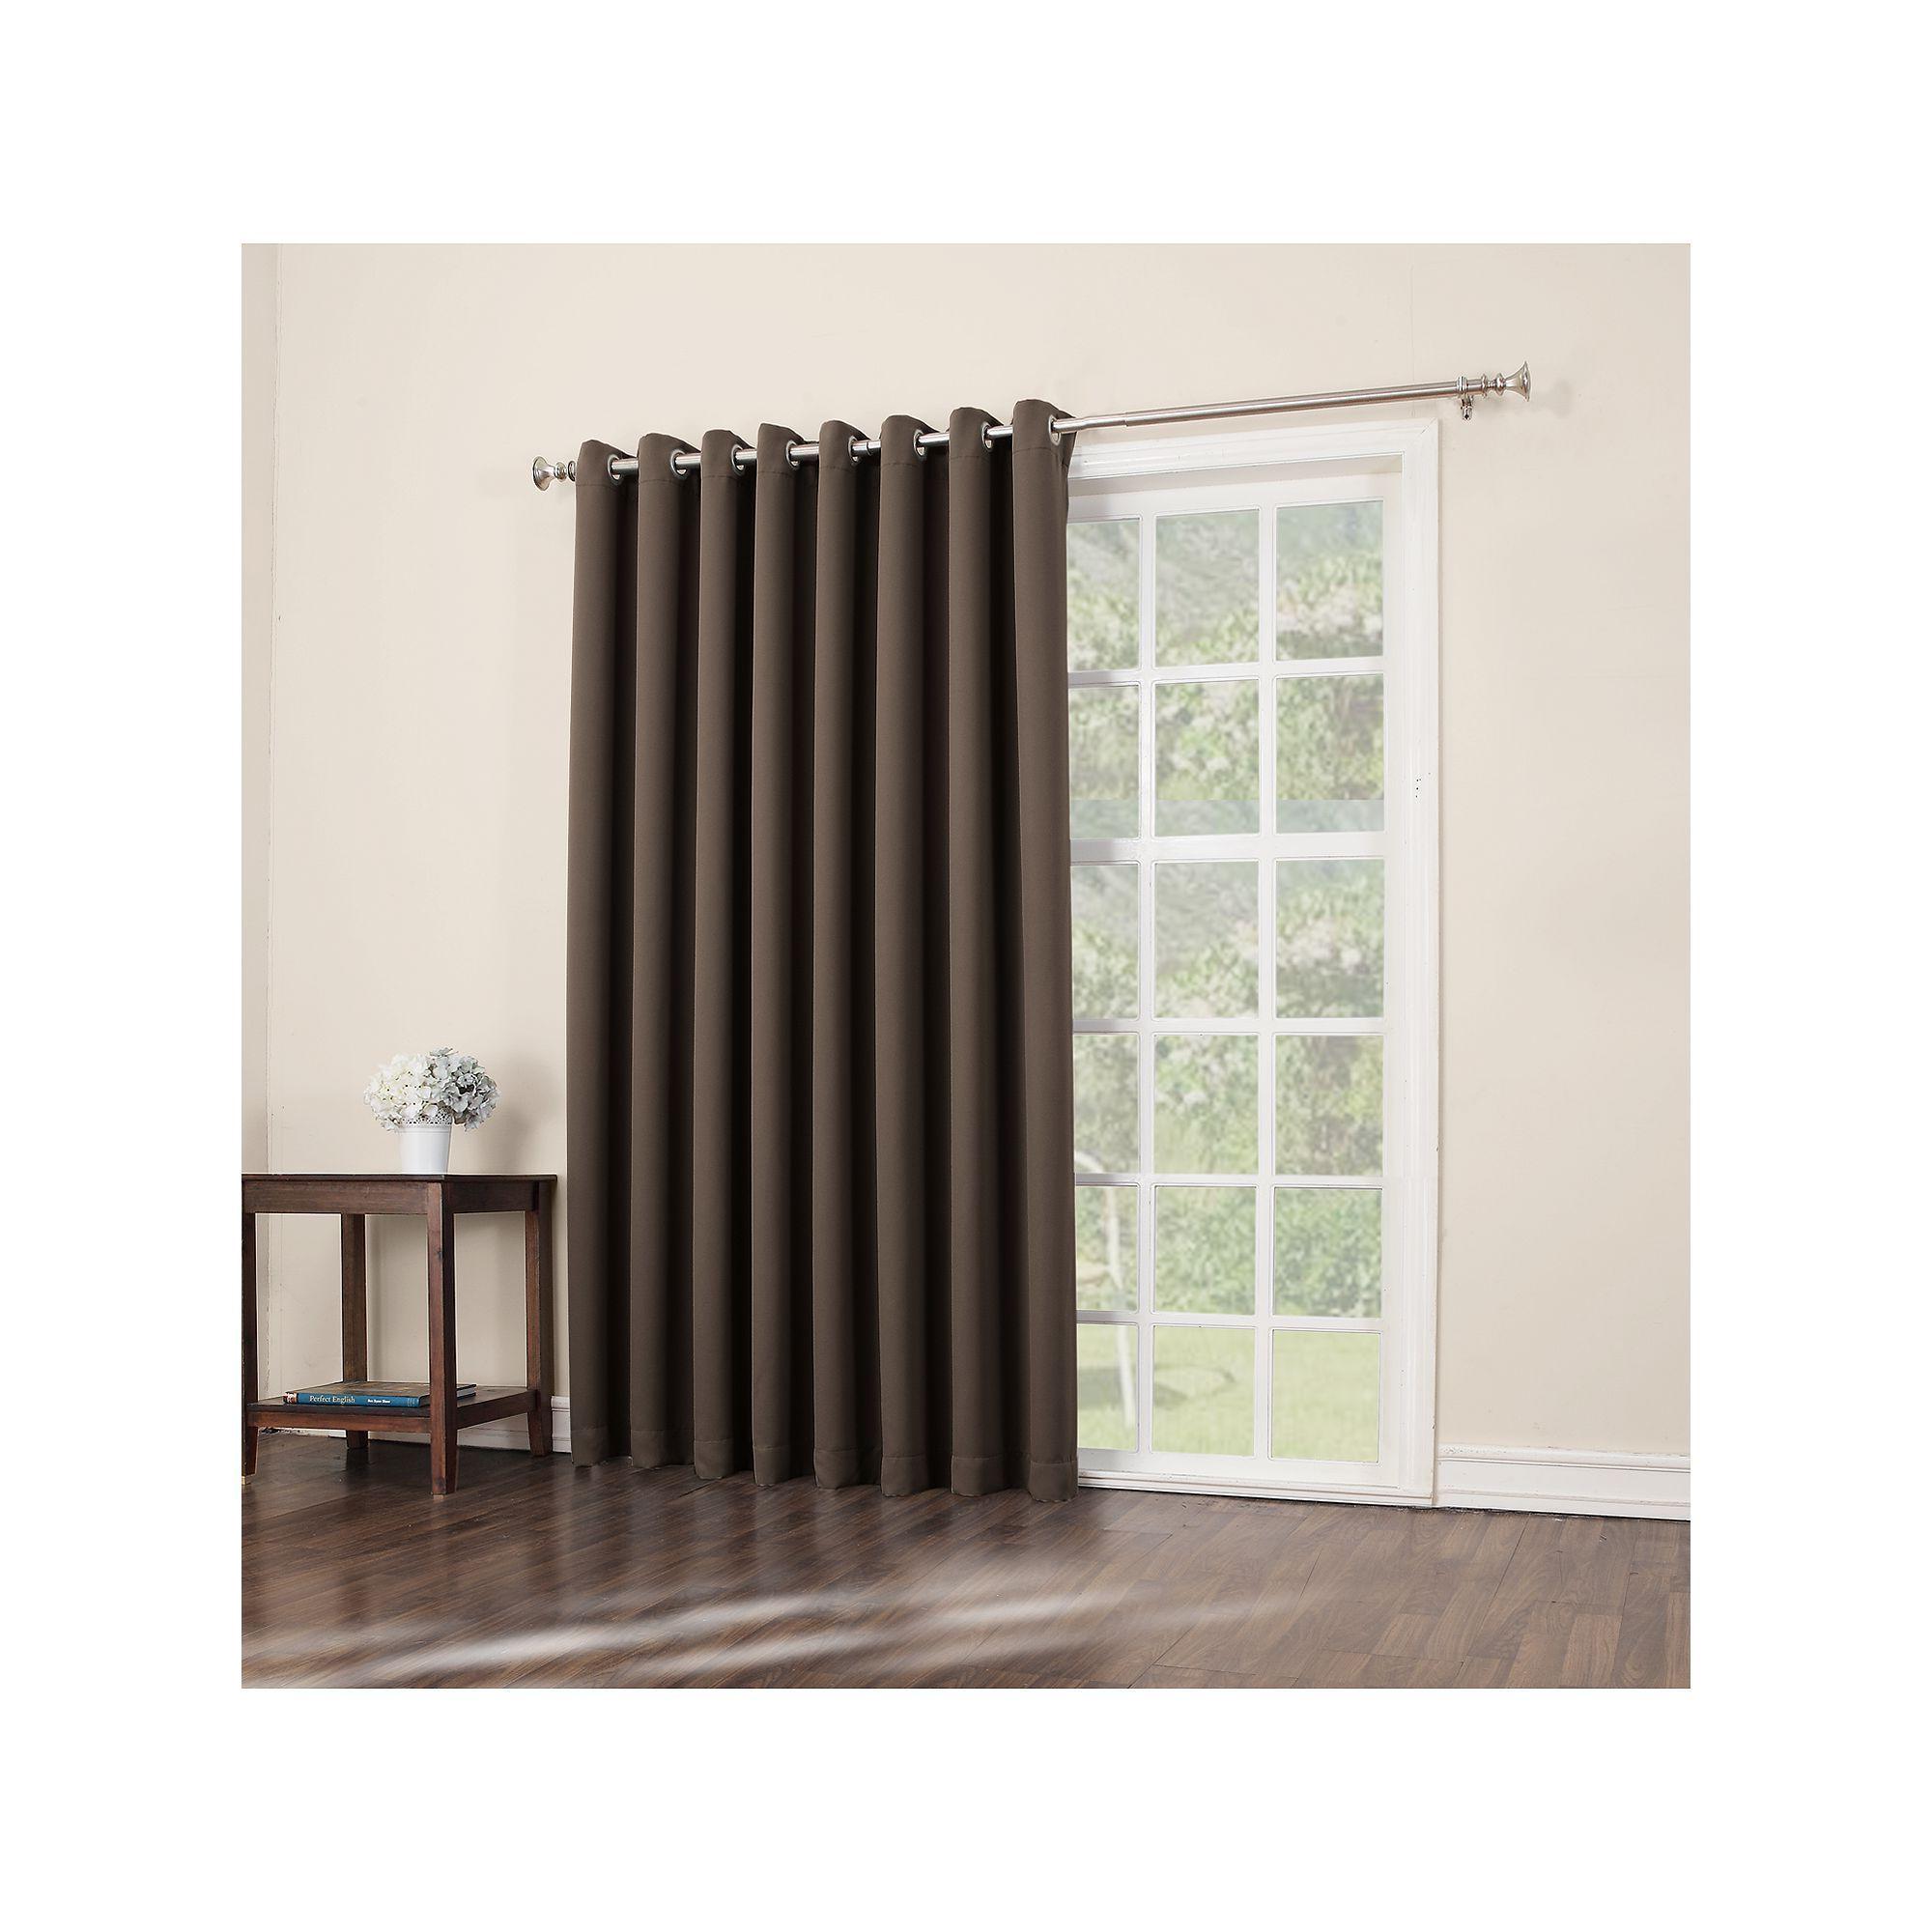 Well Known Grommet Blackout Patio Door Window Curtain Panels Regarding Sun Zero Blackout 1 Panel Ludlow Patio Door Window Curtain (View 6 of 20)